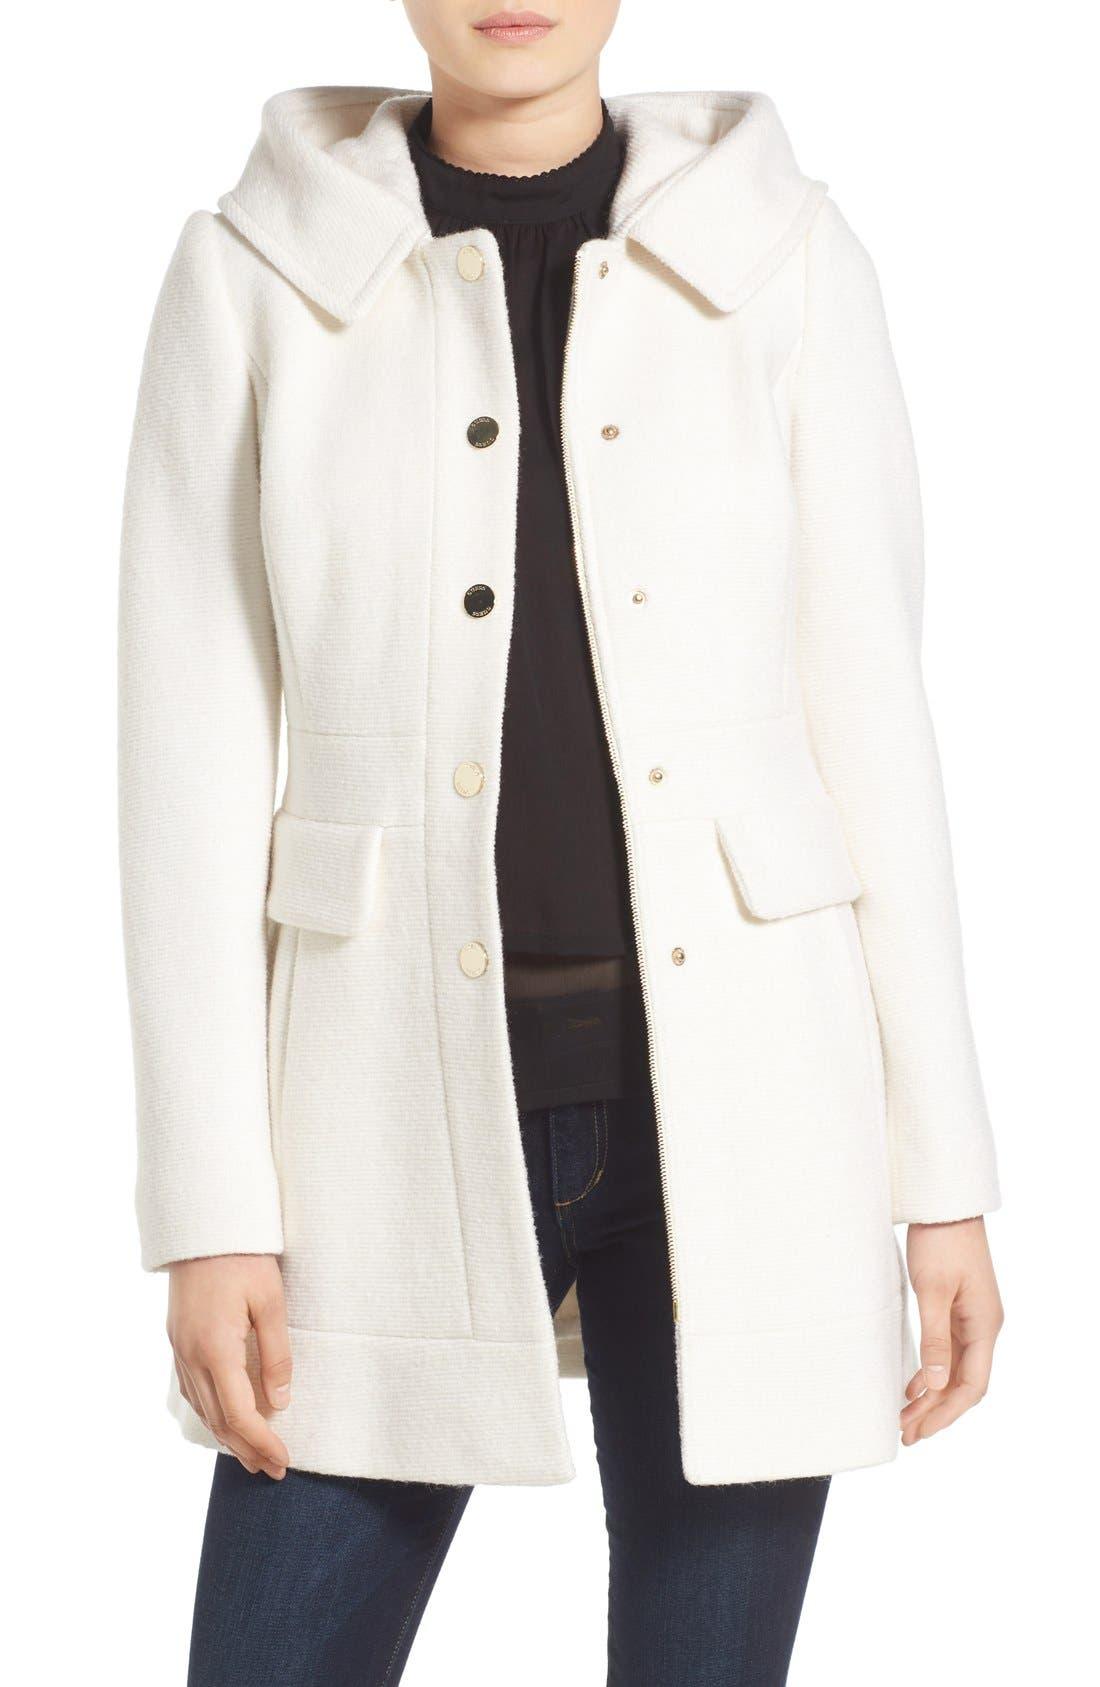 GUESS 'Mod' Hooded Jacket (Regular & Petite)